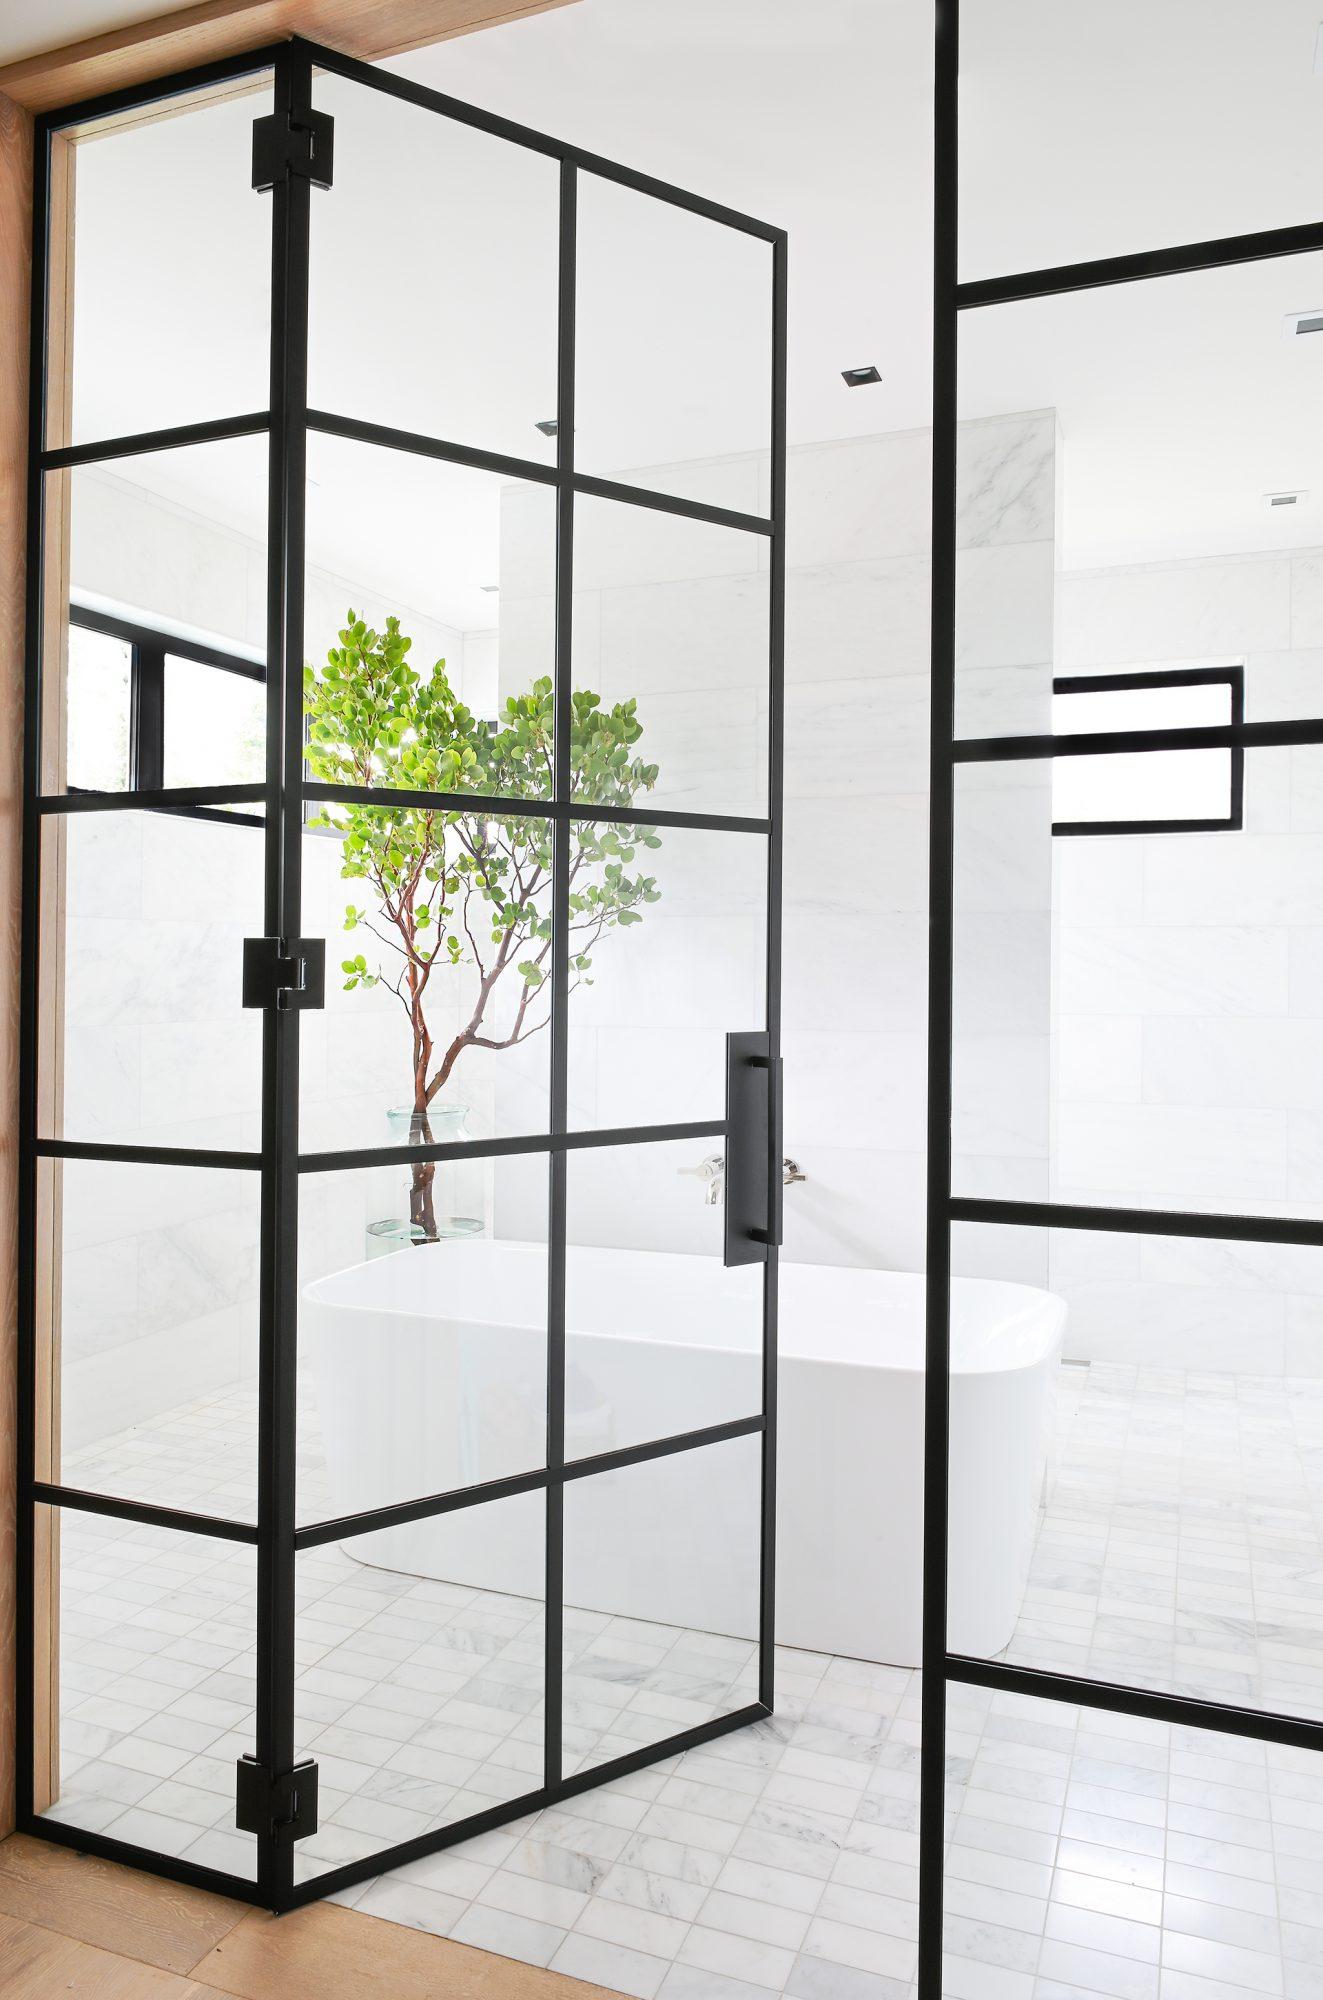 Ferme Moderne bathroom entrance built by Midland Premium Properties in Vancouver, BC